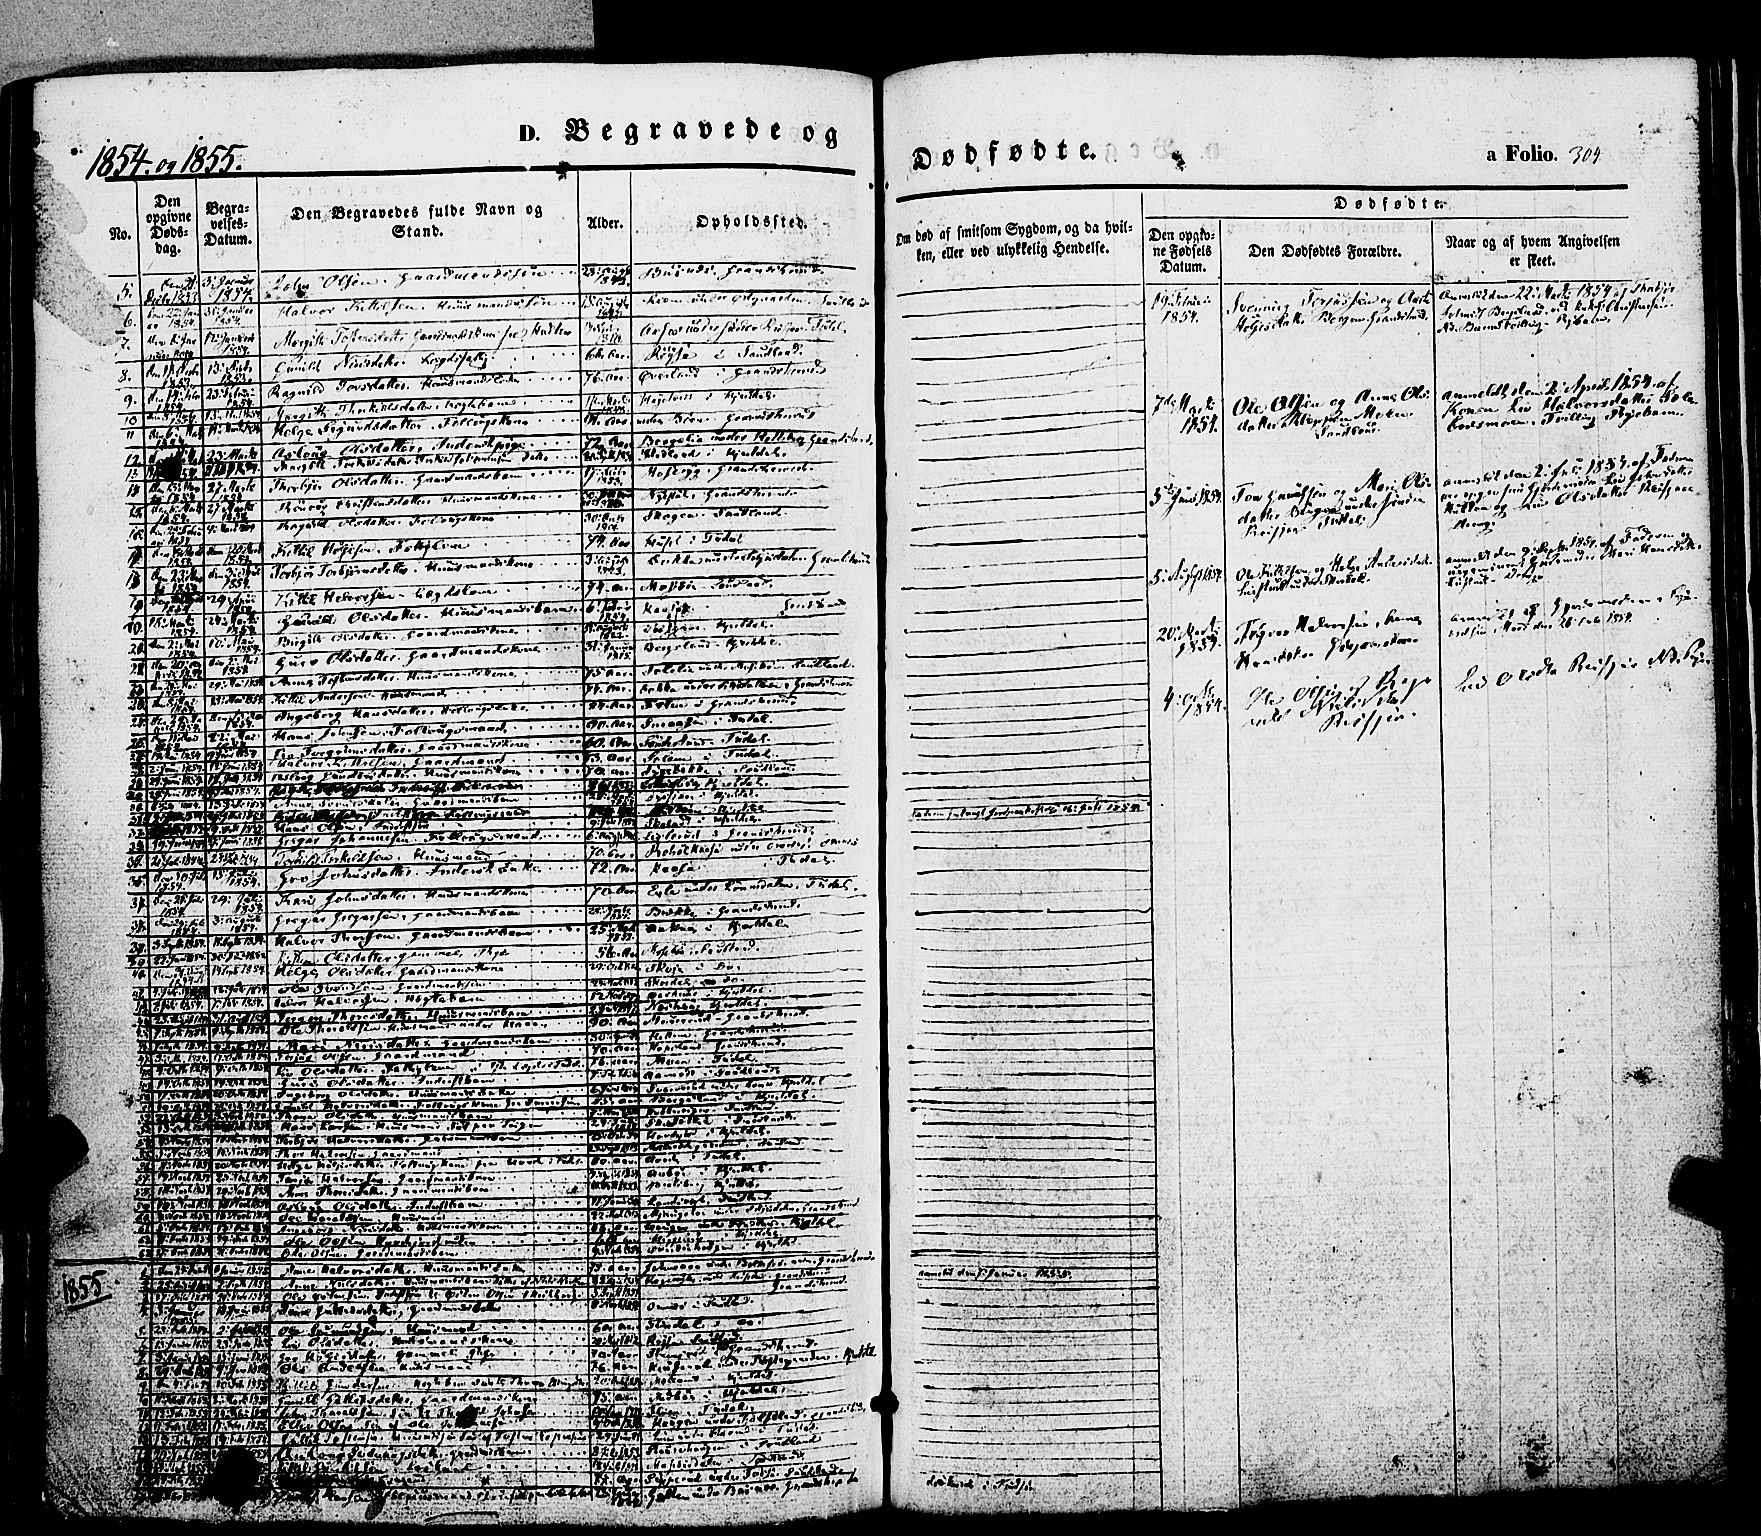 SAKO, Hjartdal kirkebøker, F/Fa/L0008: Ministerialbok nr. I 8, 1844-1859, s. 304